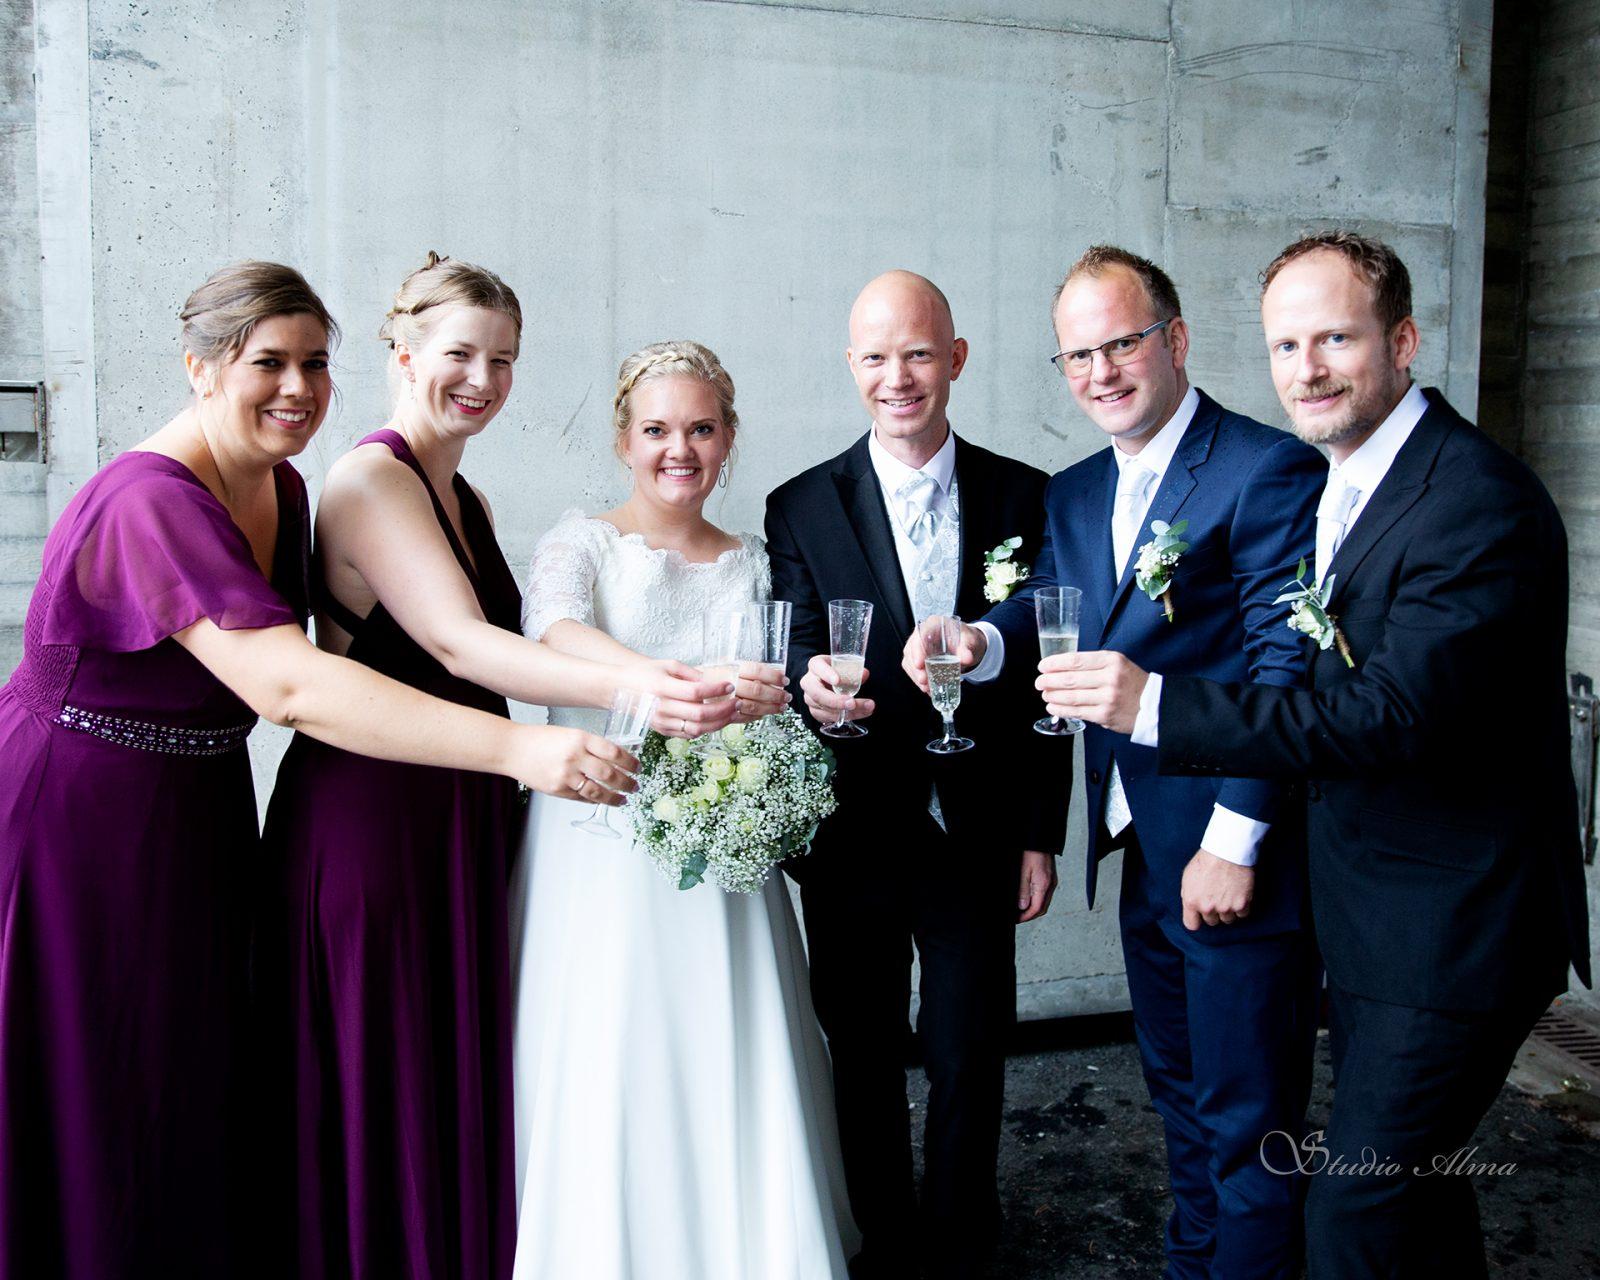 brudepar-forlovere-bryllup-studioalma-fotograf